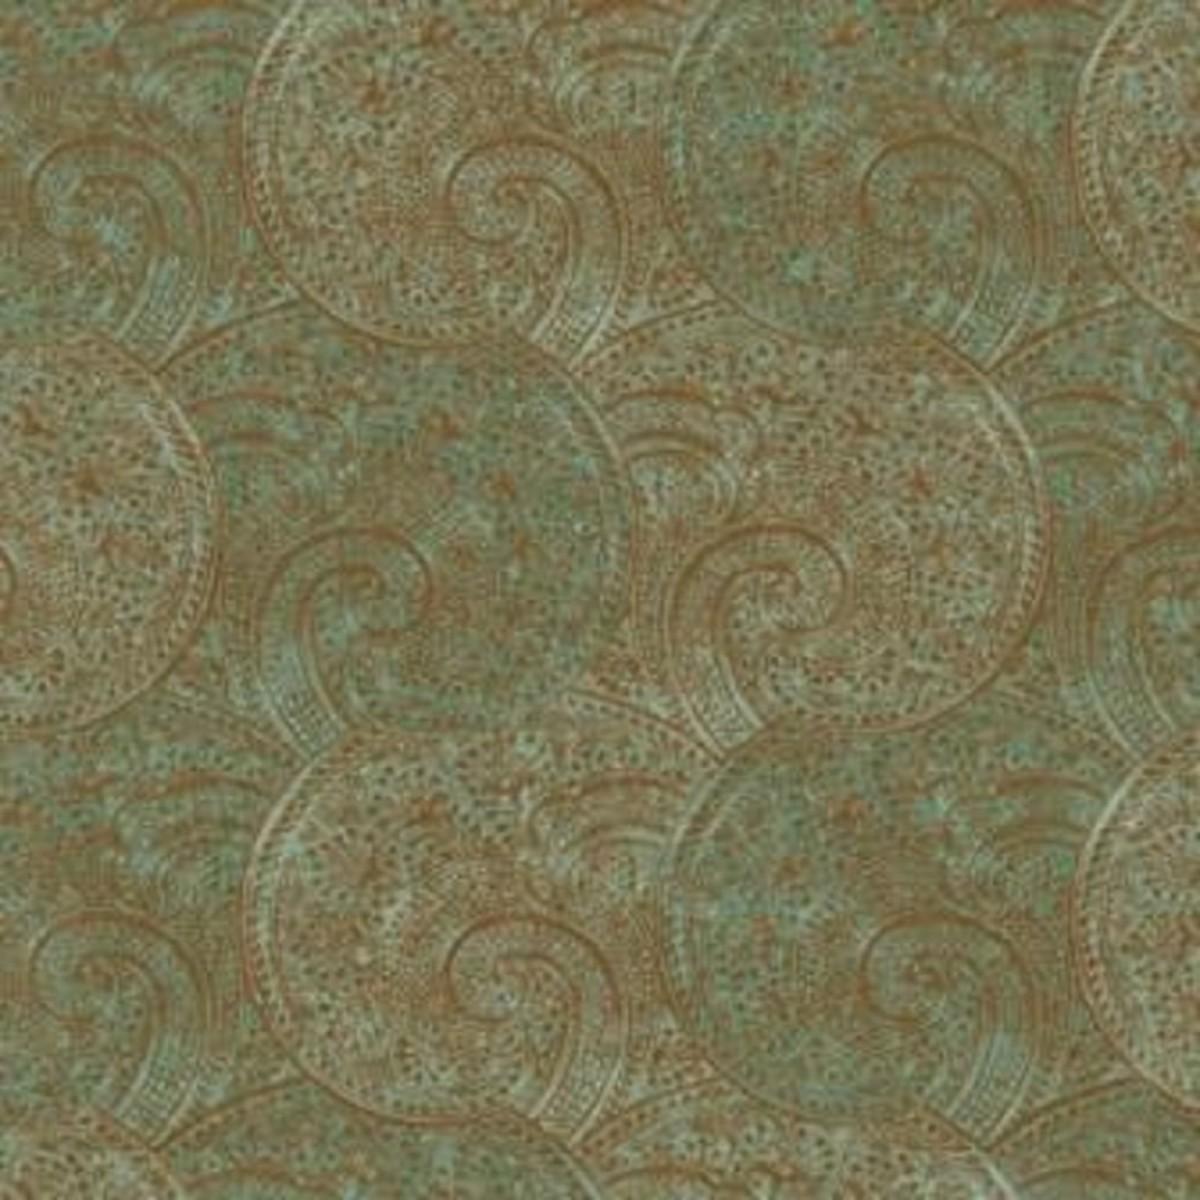 Виниловые обои York Wallcoverings зеленые TH6348 0.68 м